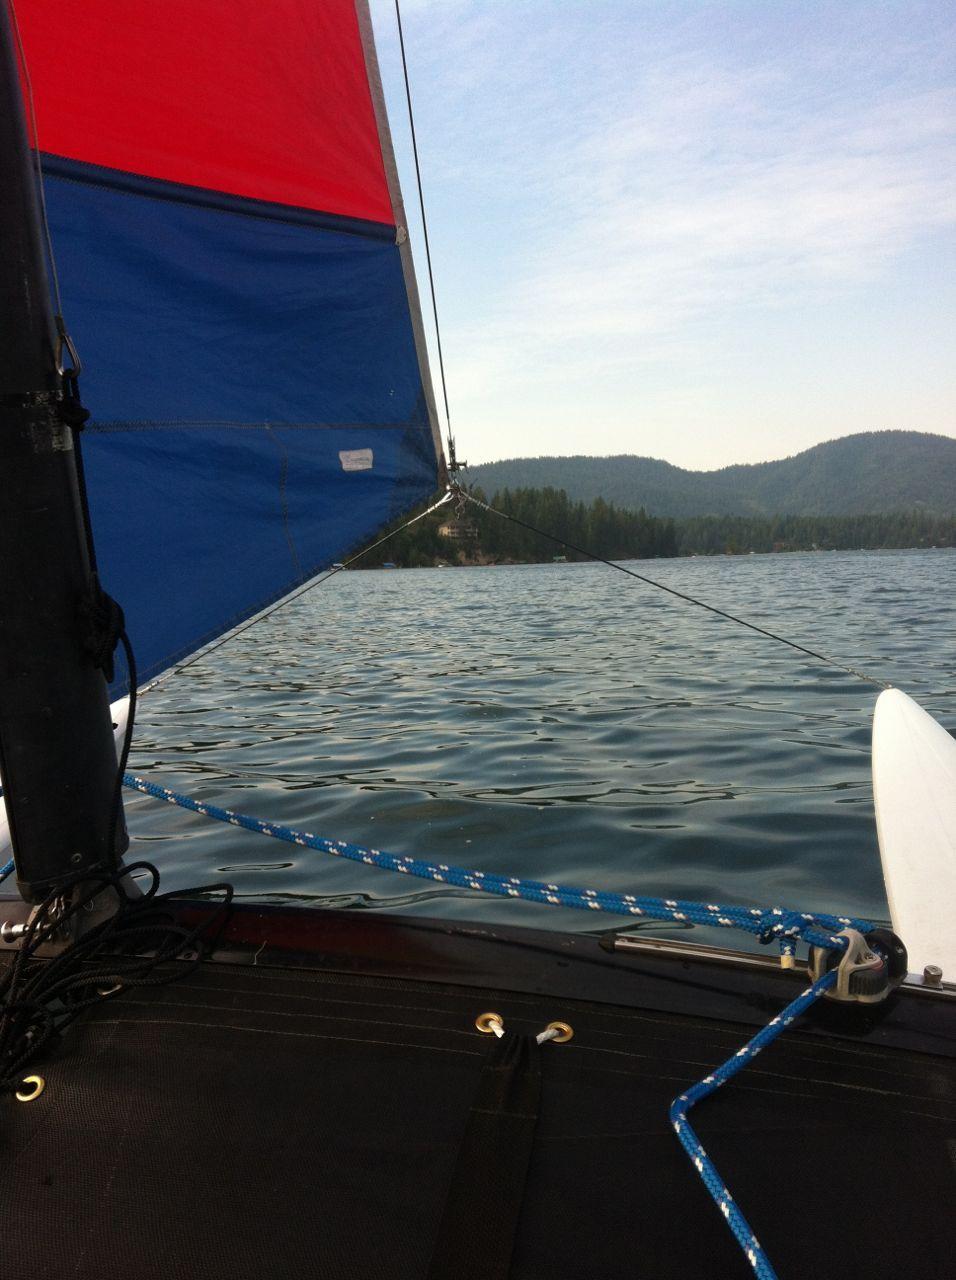 Hobie Cat 16. GWS Catamaran, Sailing, Airplane view